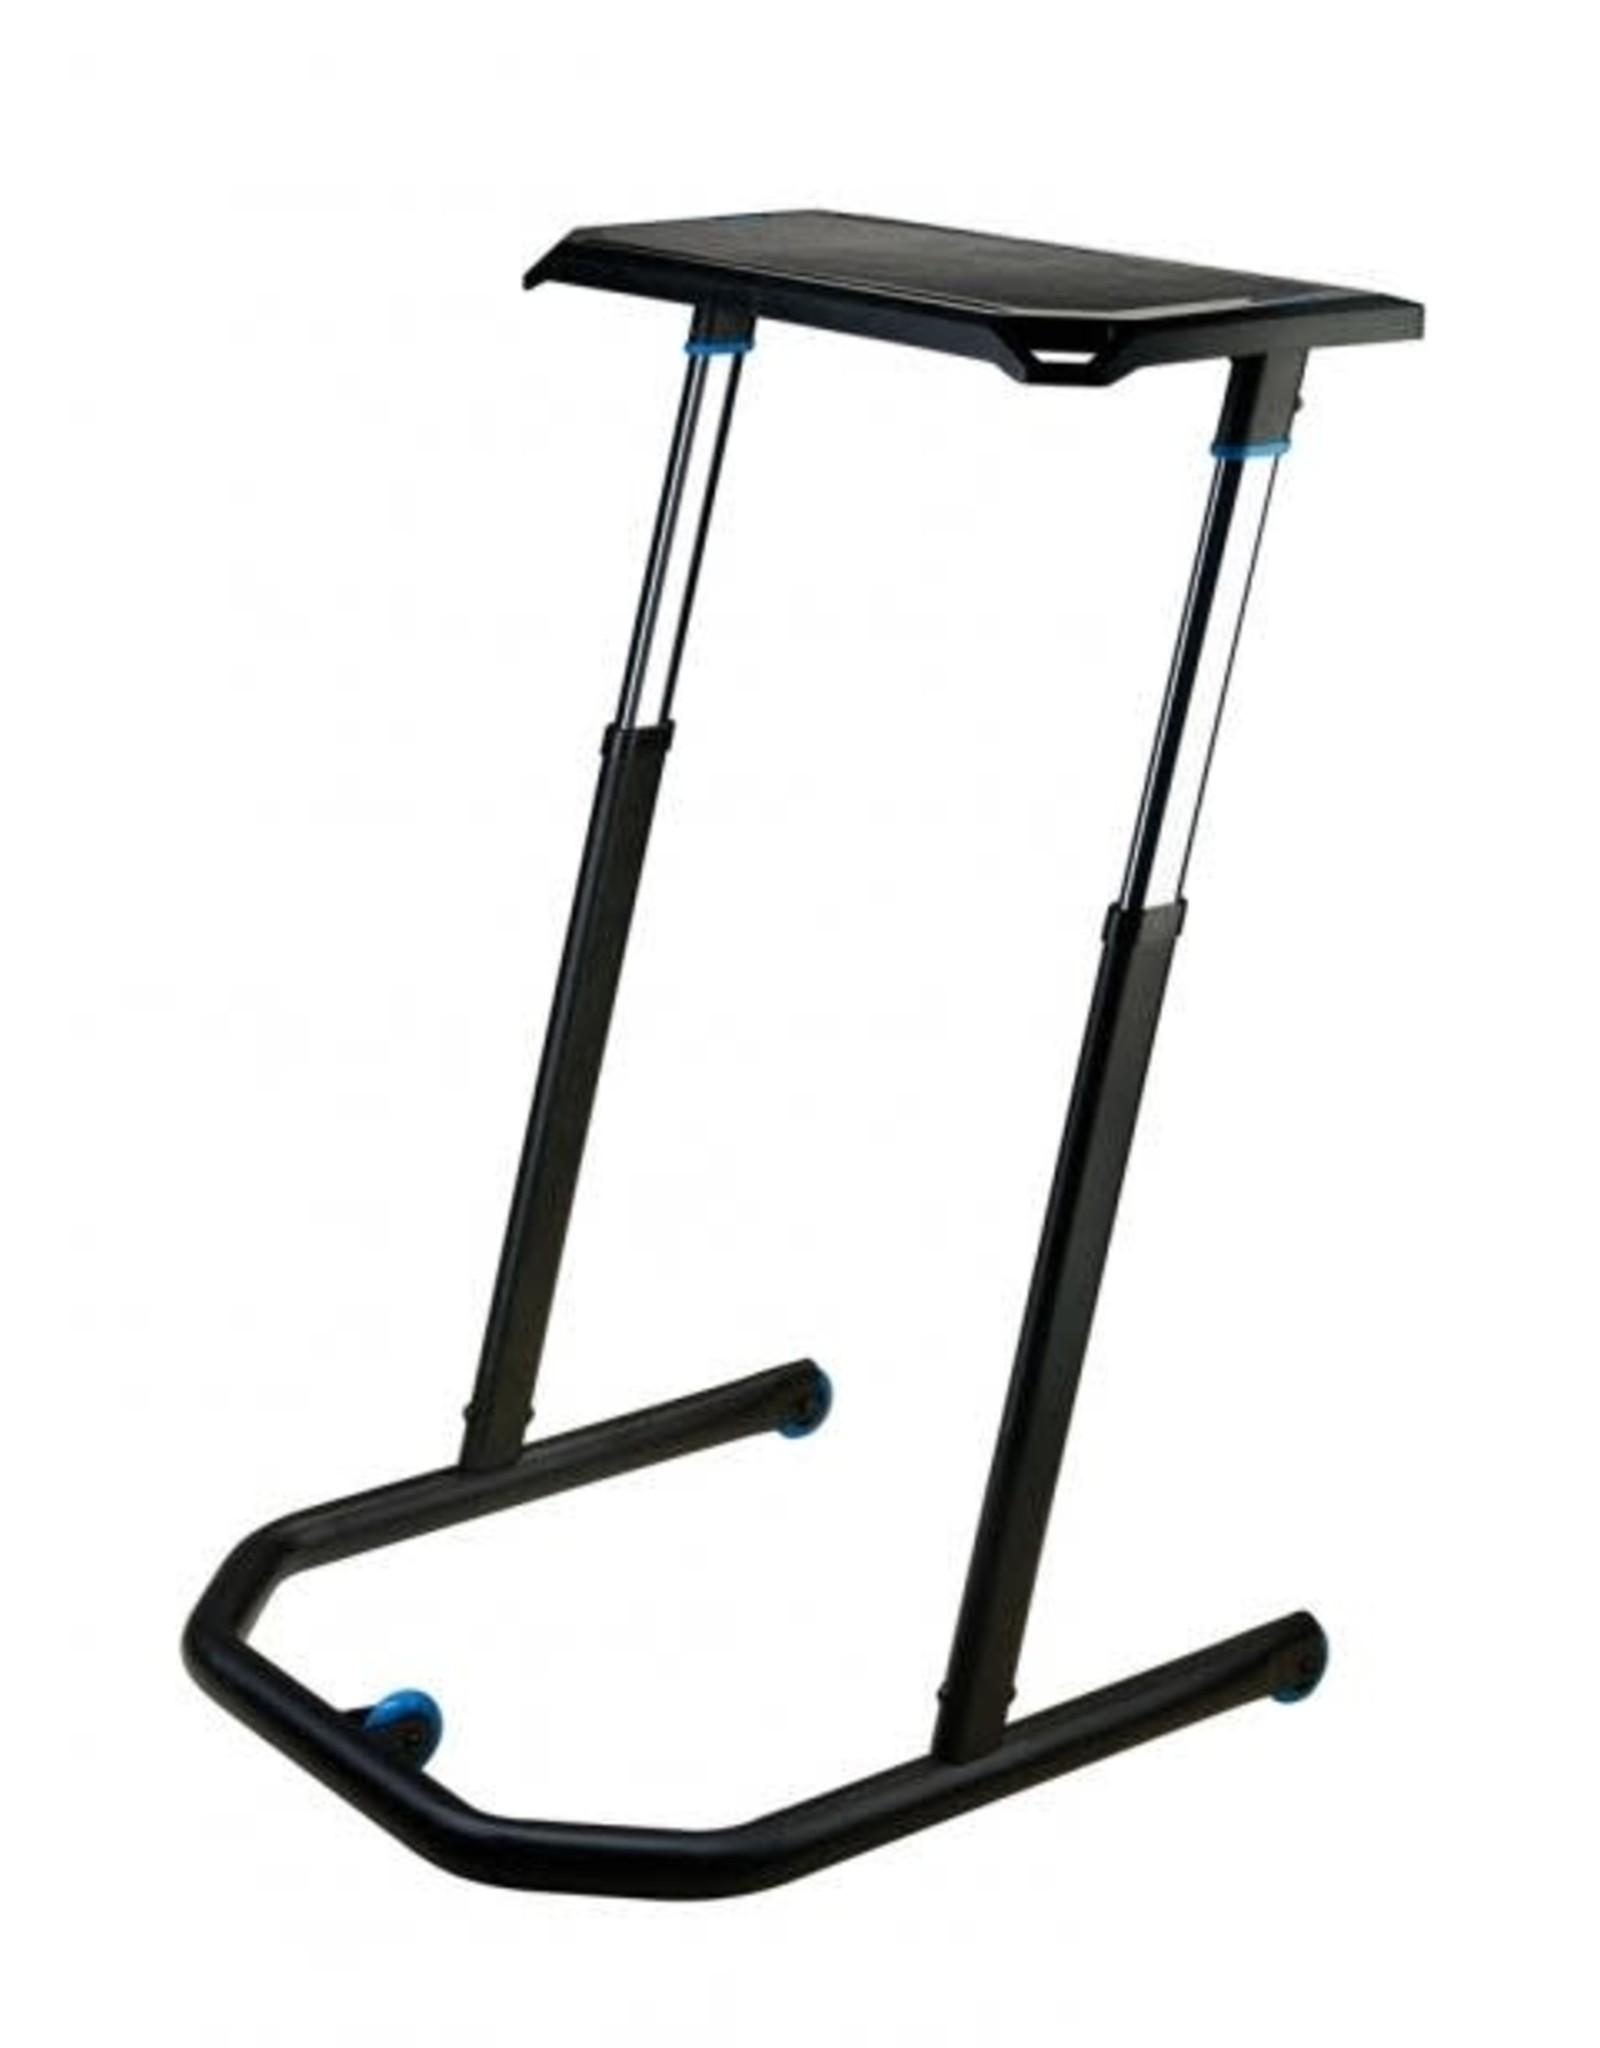 Wahoo Fitness Desk